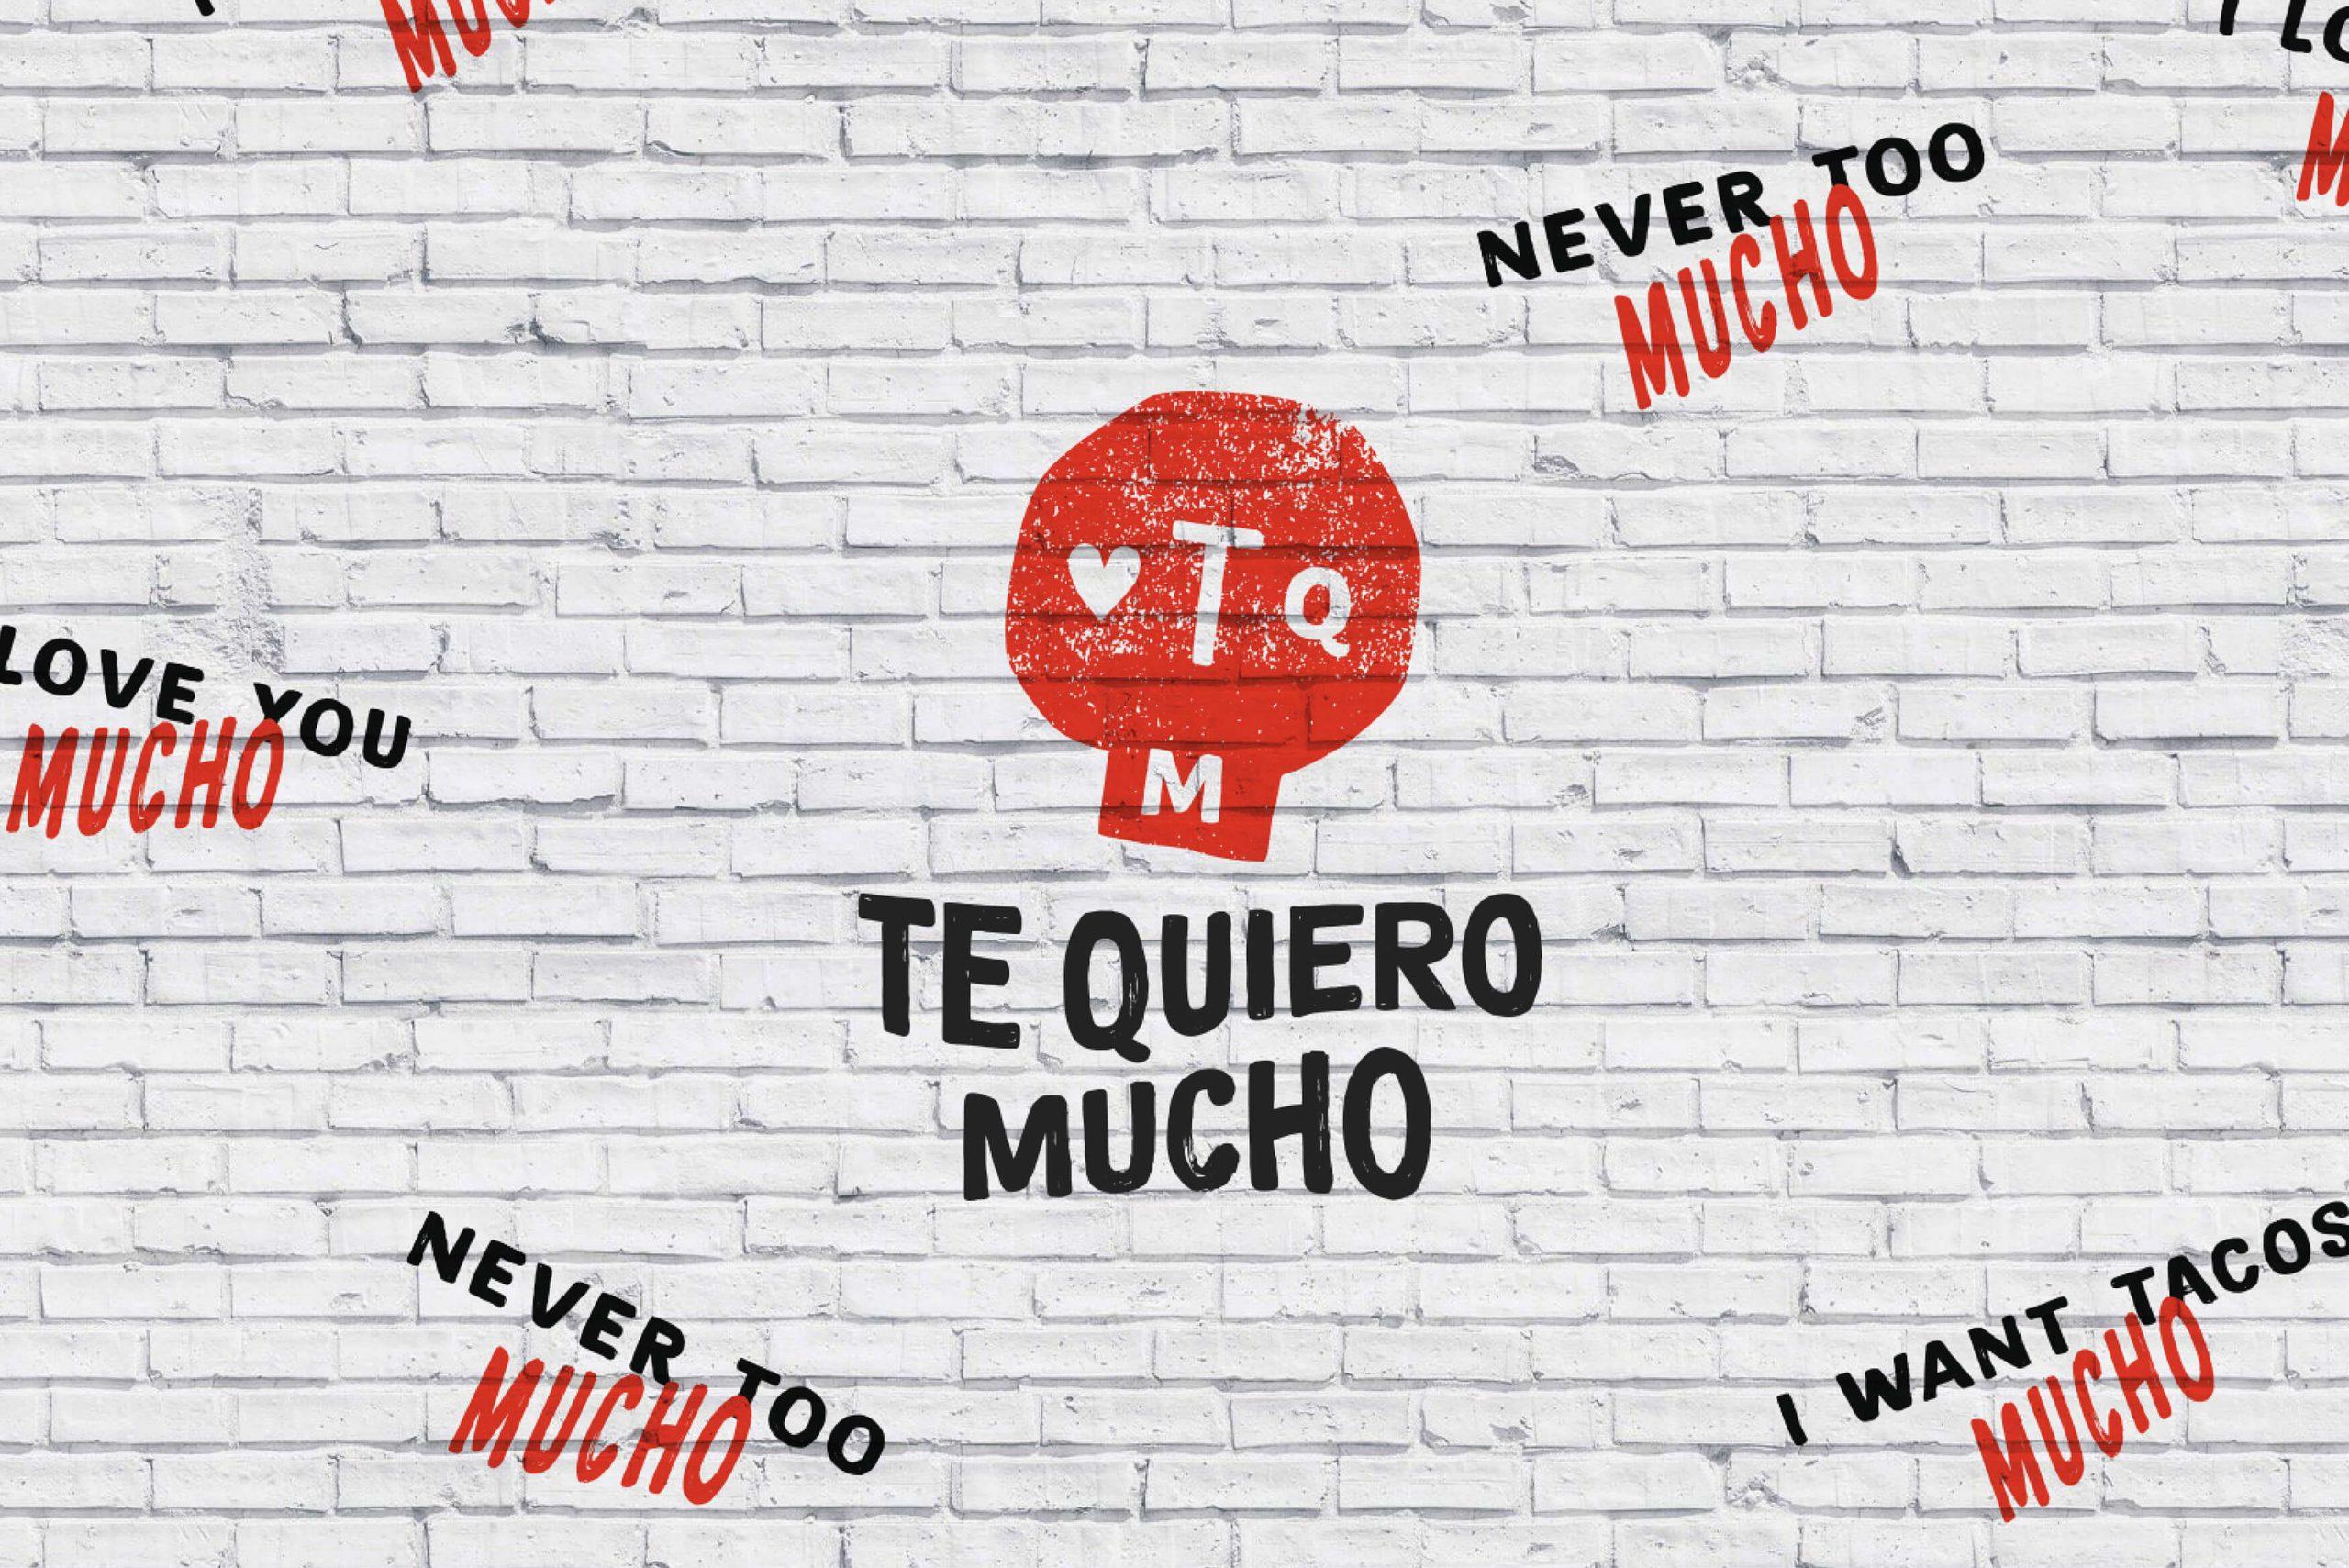 Ovolo Te Quiero Mucho Hospitality Identity - Logotype painted on brick wall